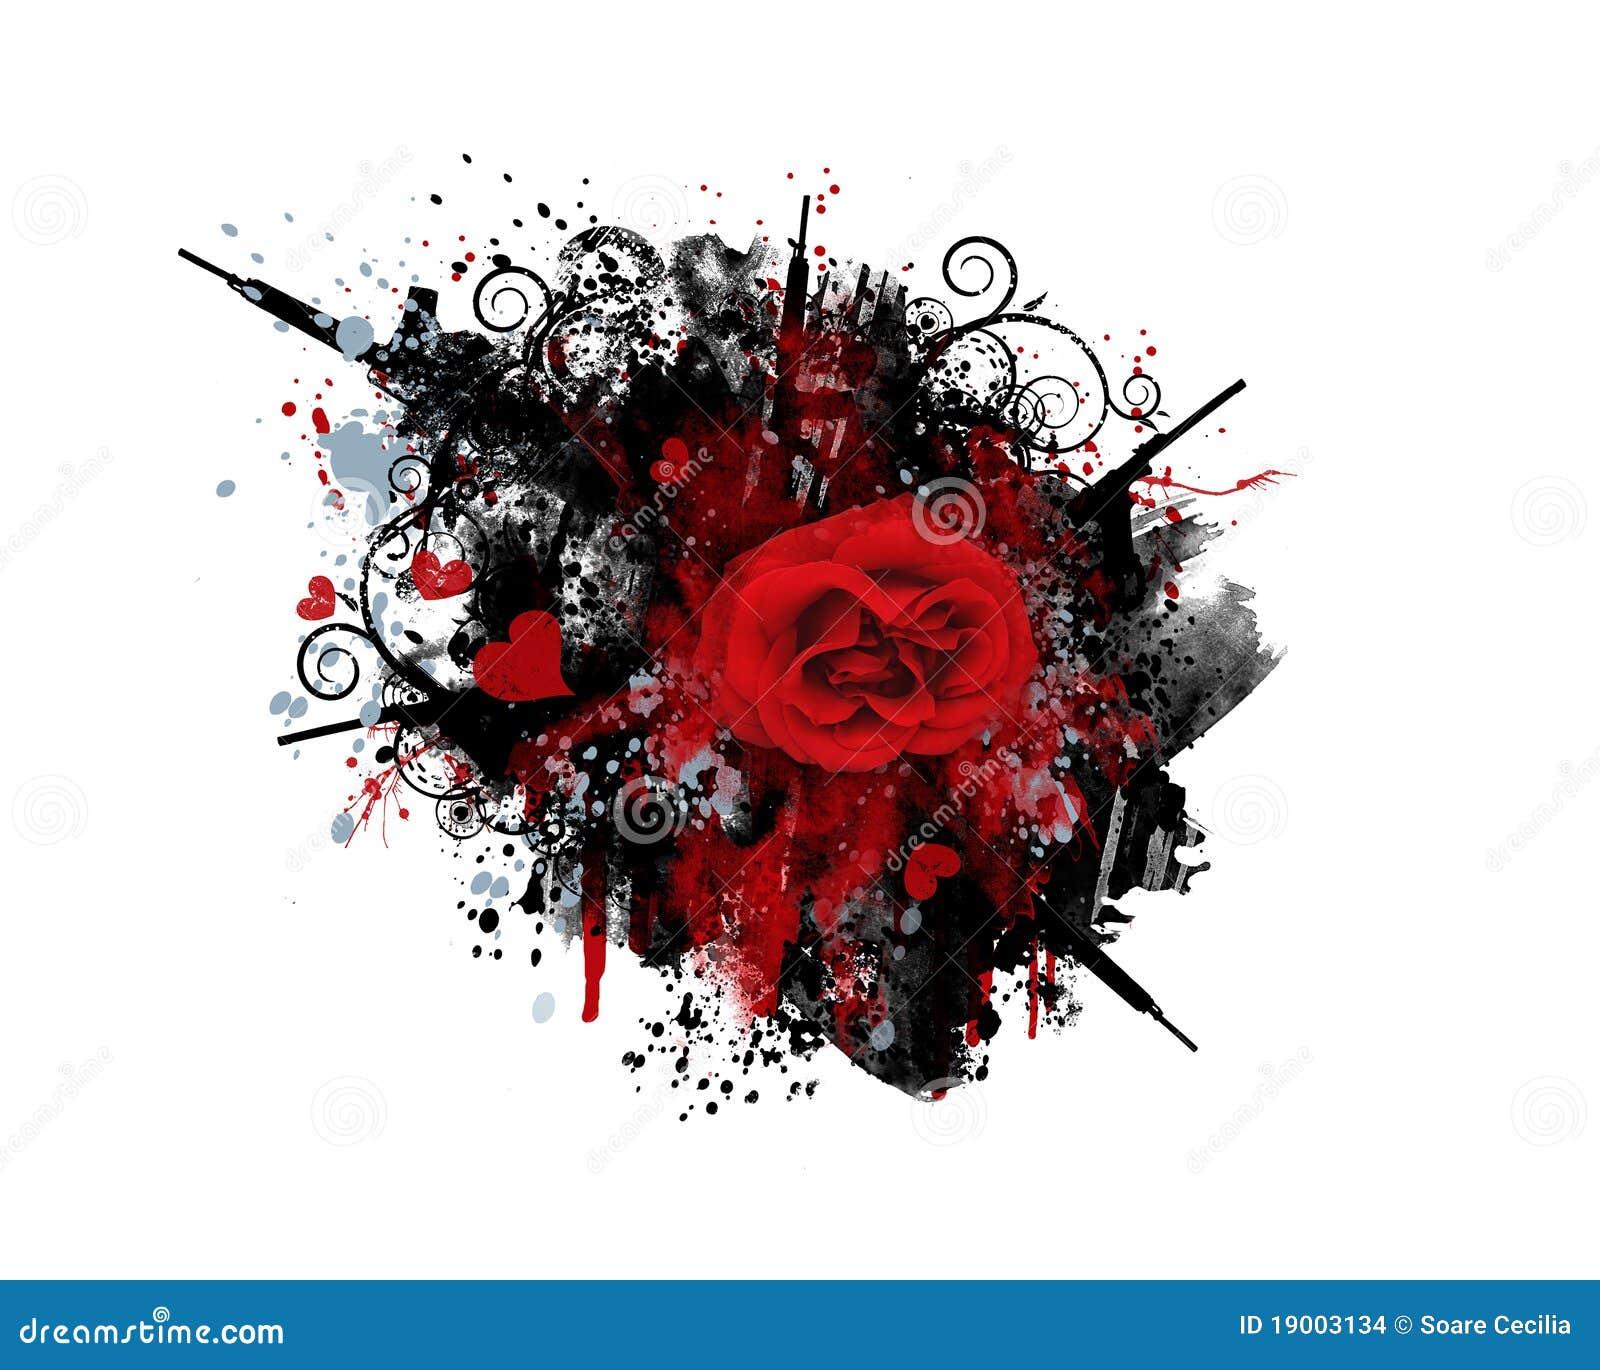 Rose guns and hearts grunge graffiti